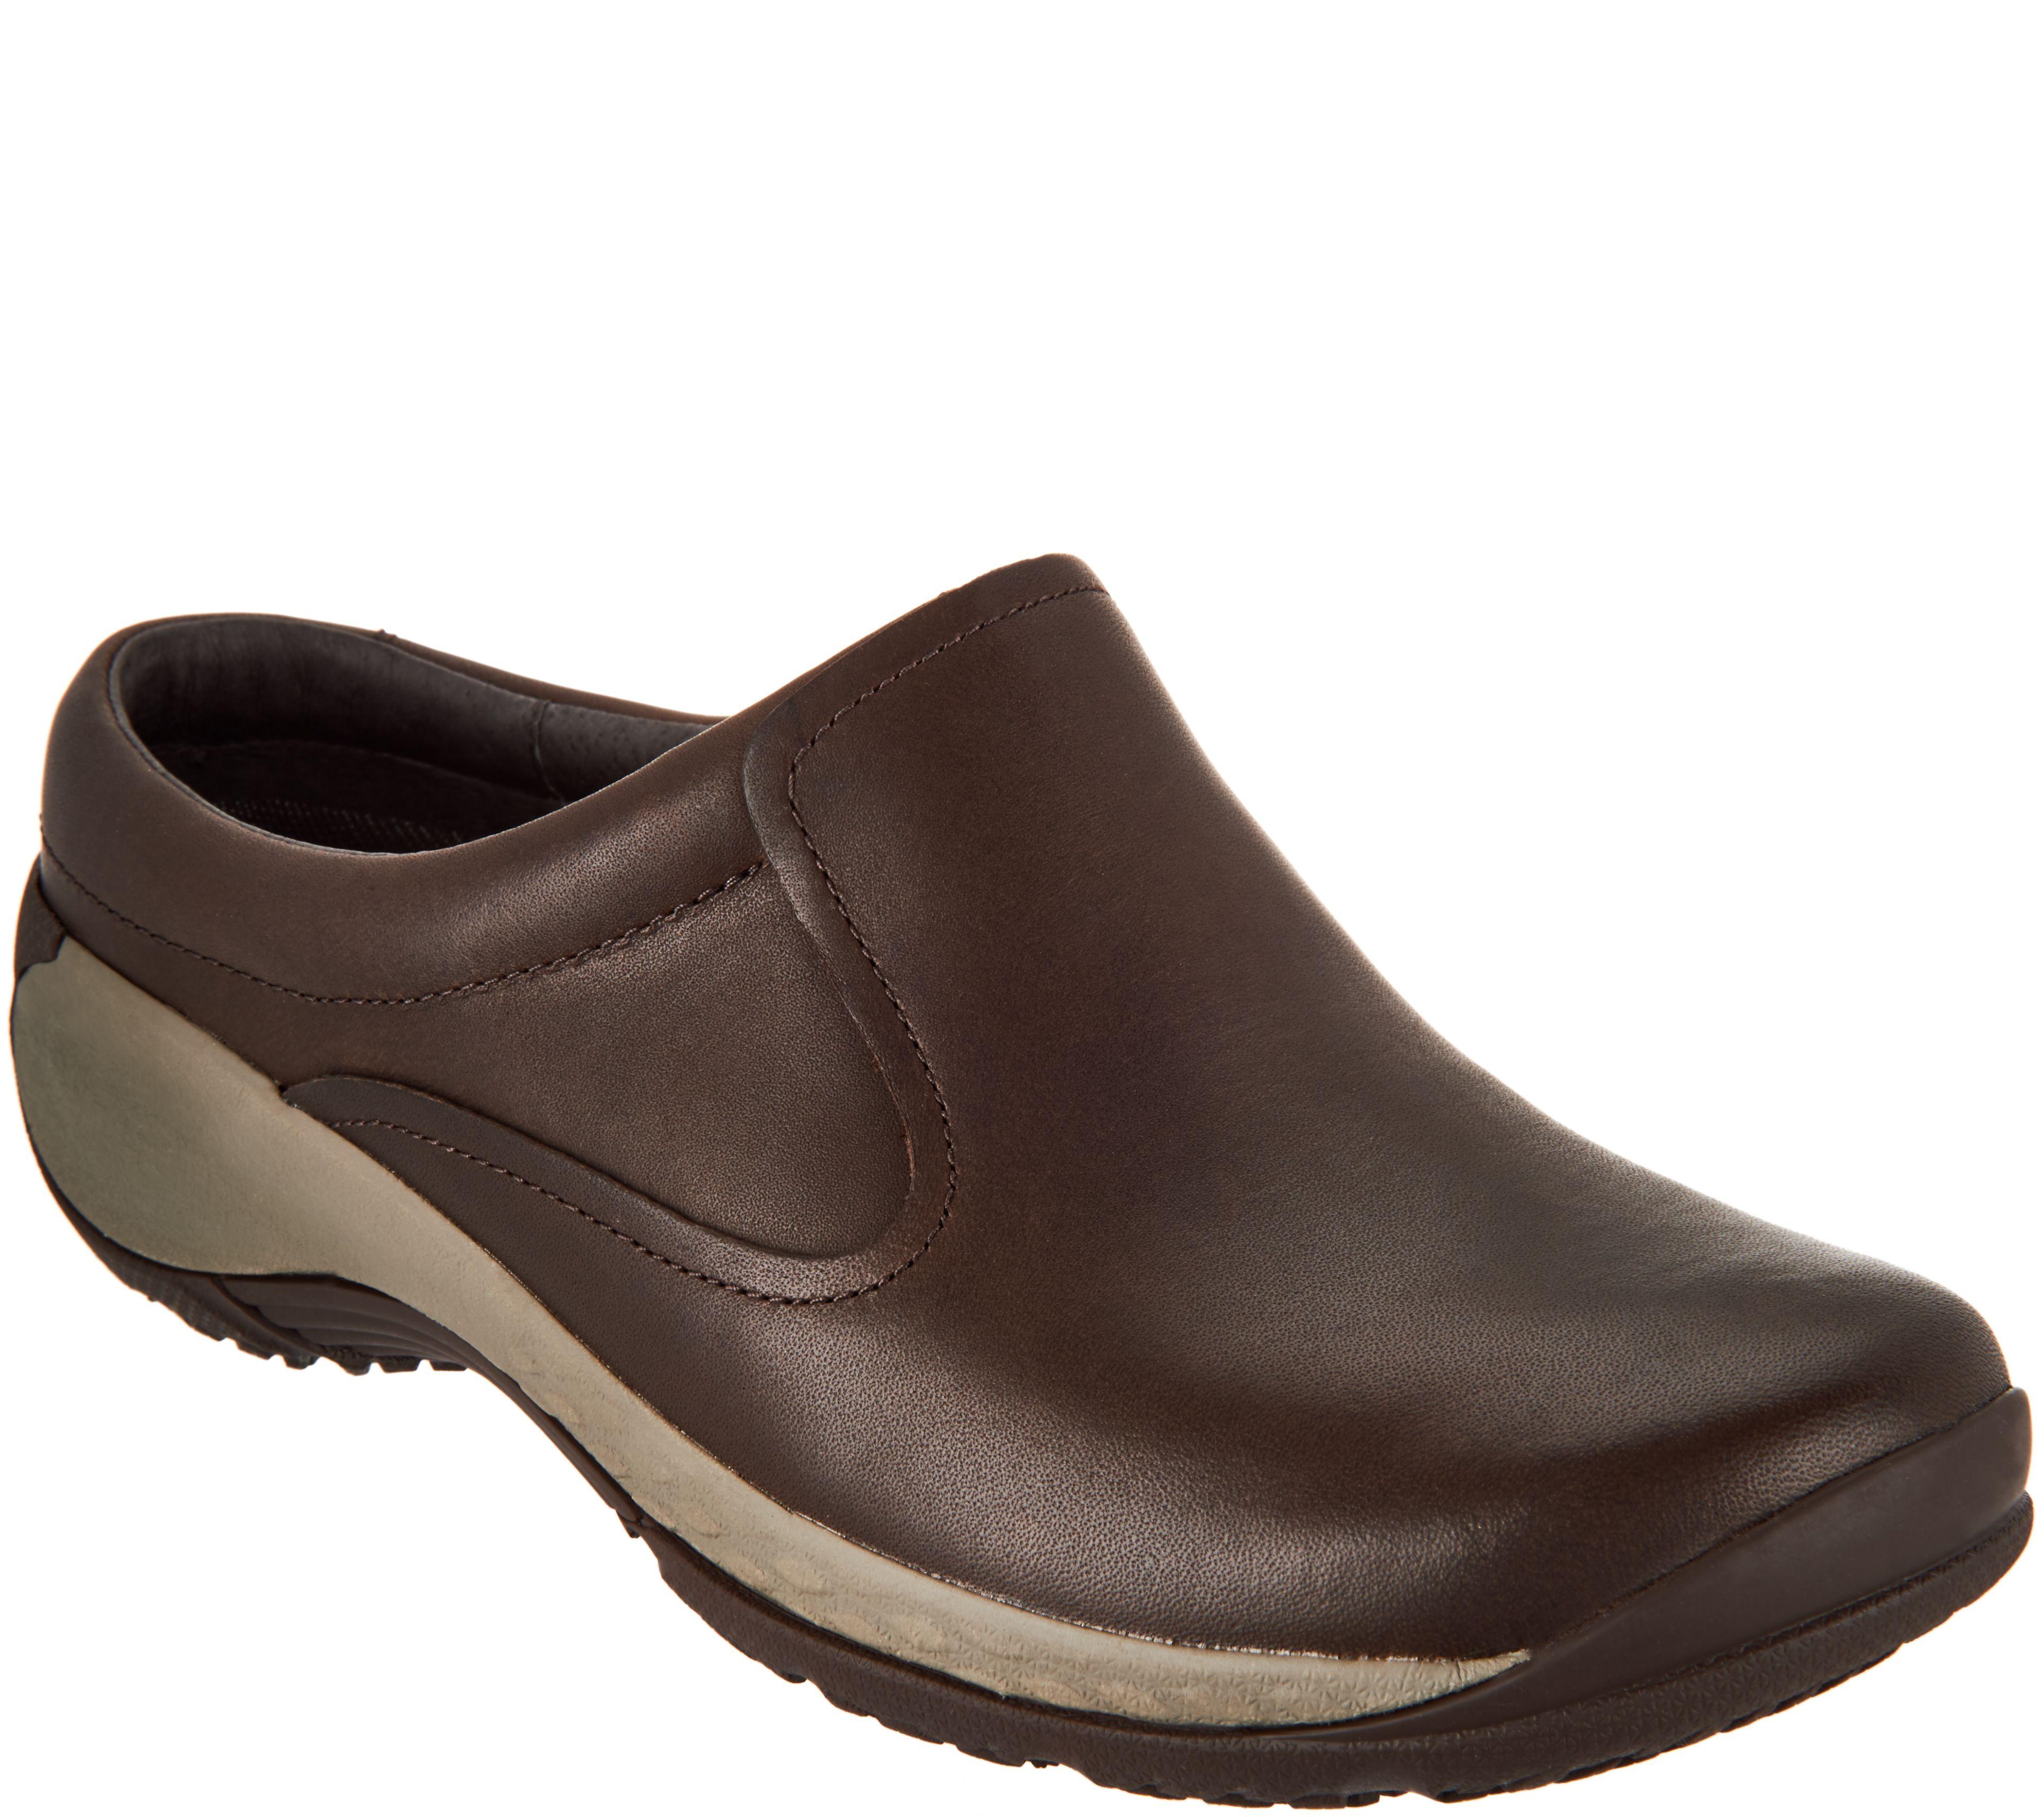 c4c934055eee Merrell Leather Slip-On Clogs - Encore Q2 - Page 1 — QVC.com